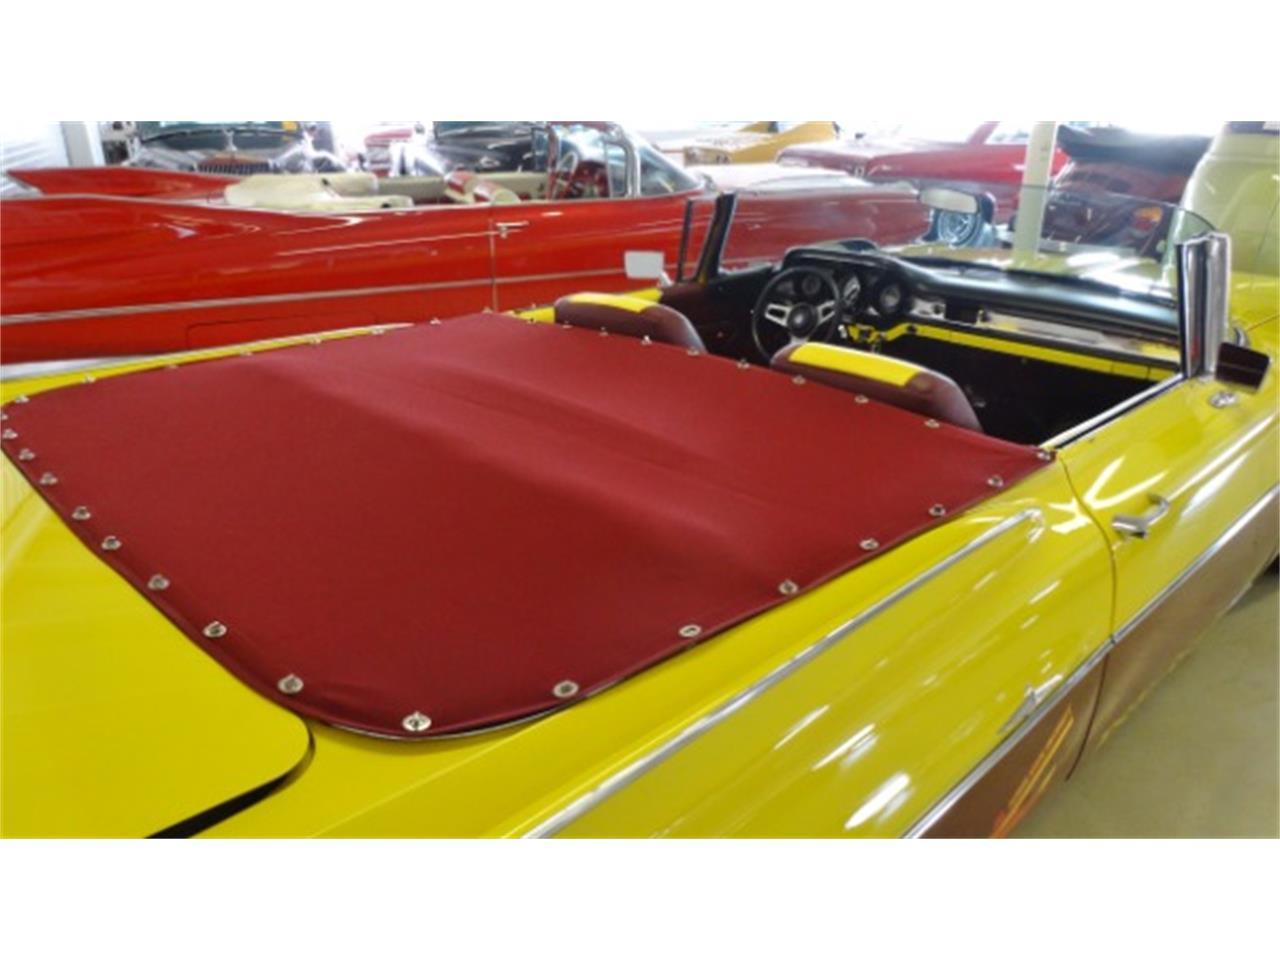 Large Picture of '59 Pontiac Star Chief - $21,995.00 - Q1LI